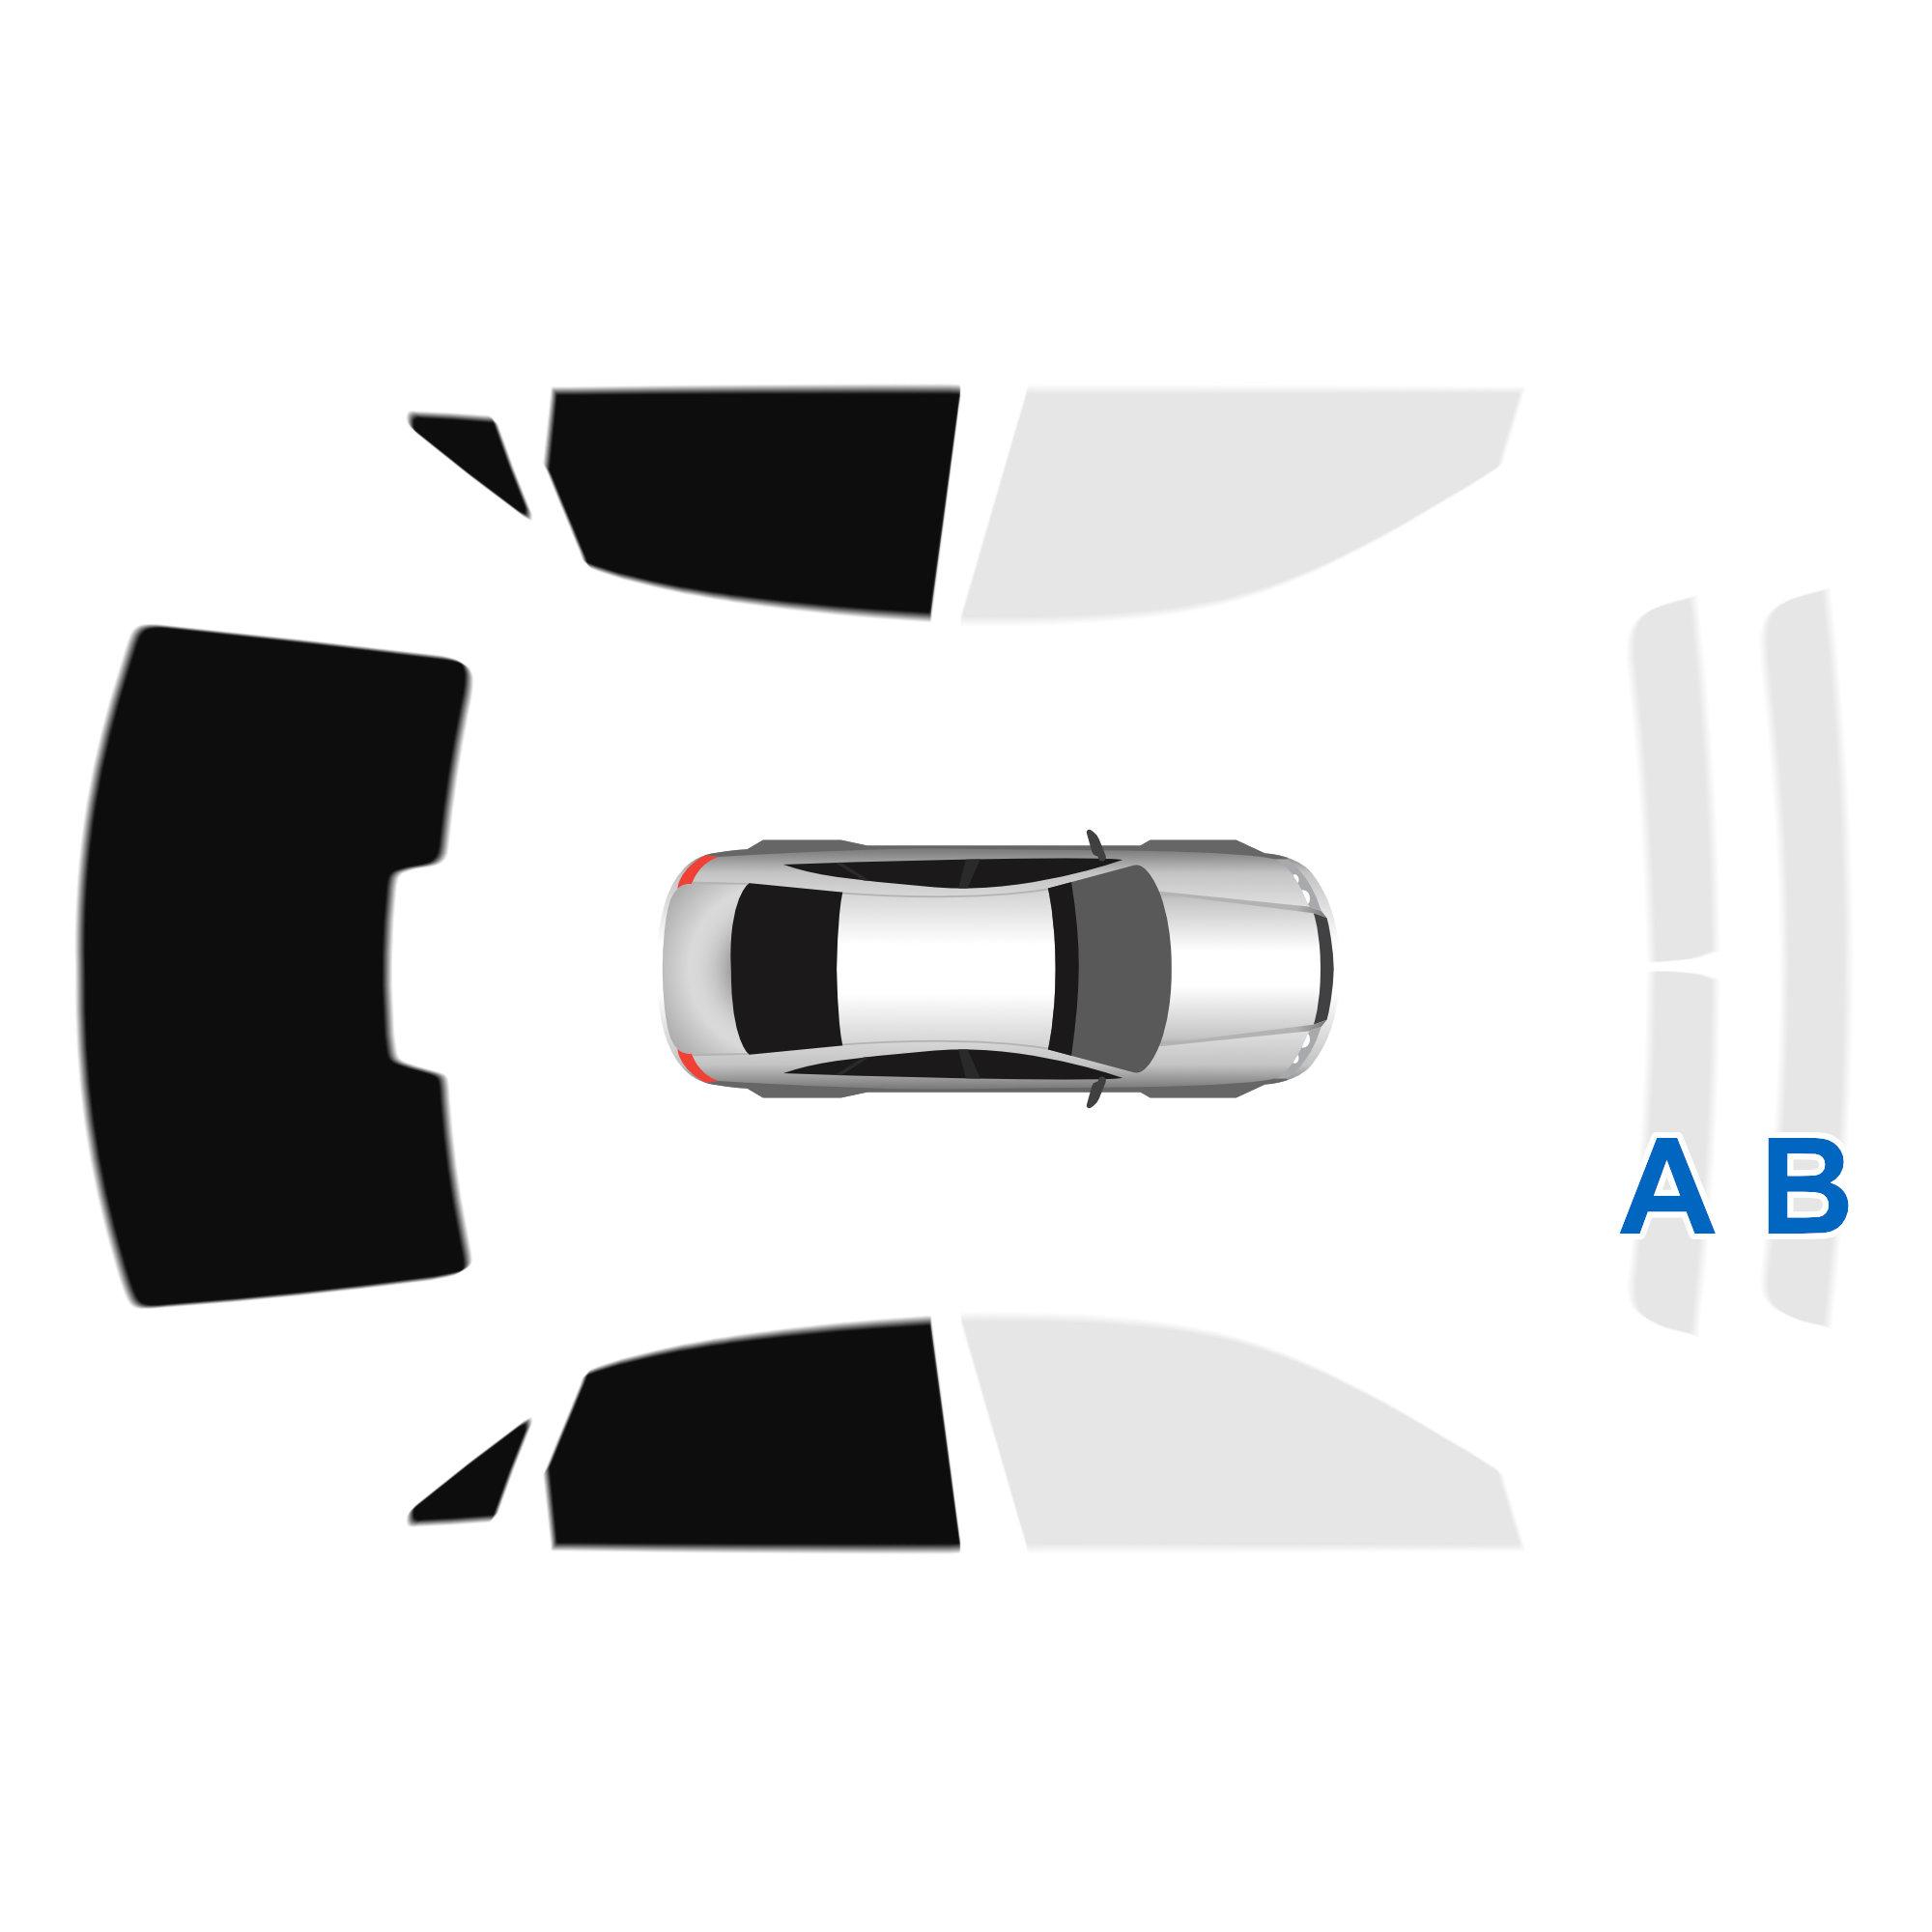 Passgenaue Heckscheiben Tönungsfolie Audi A3 8V Limo 2013 heute